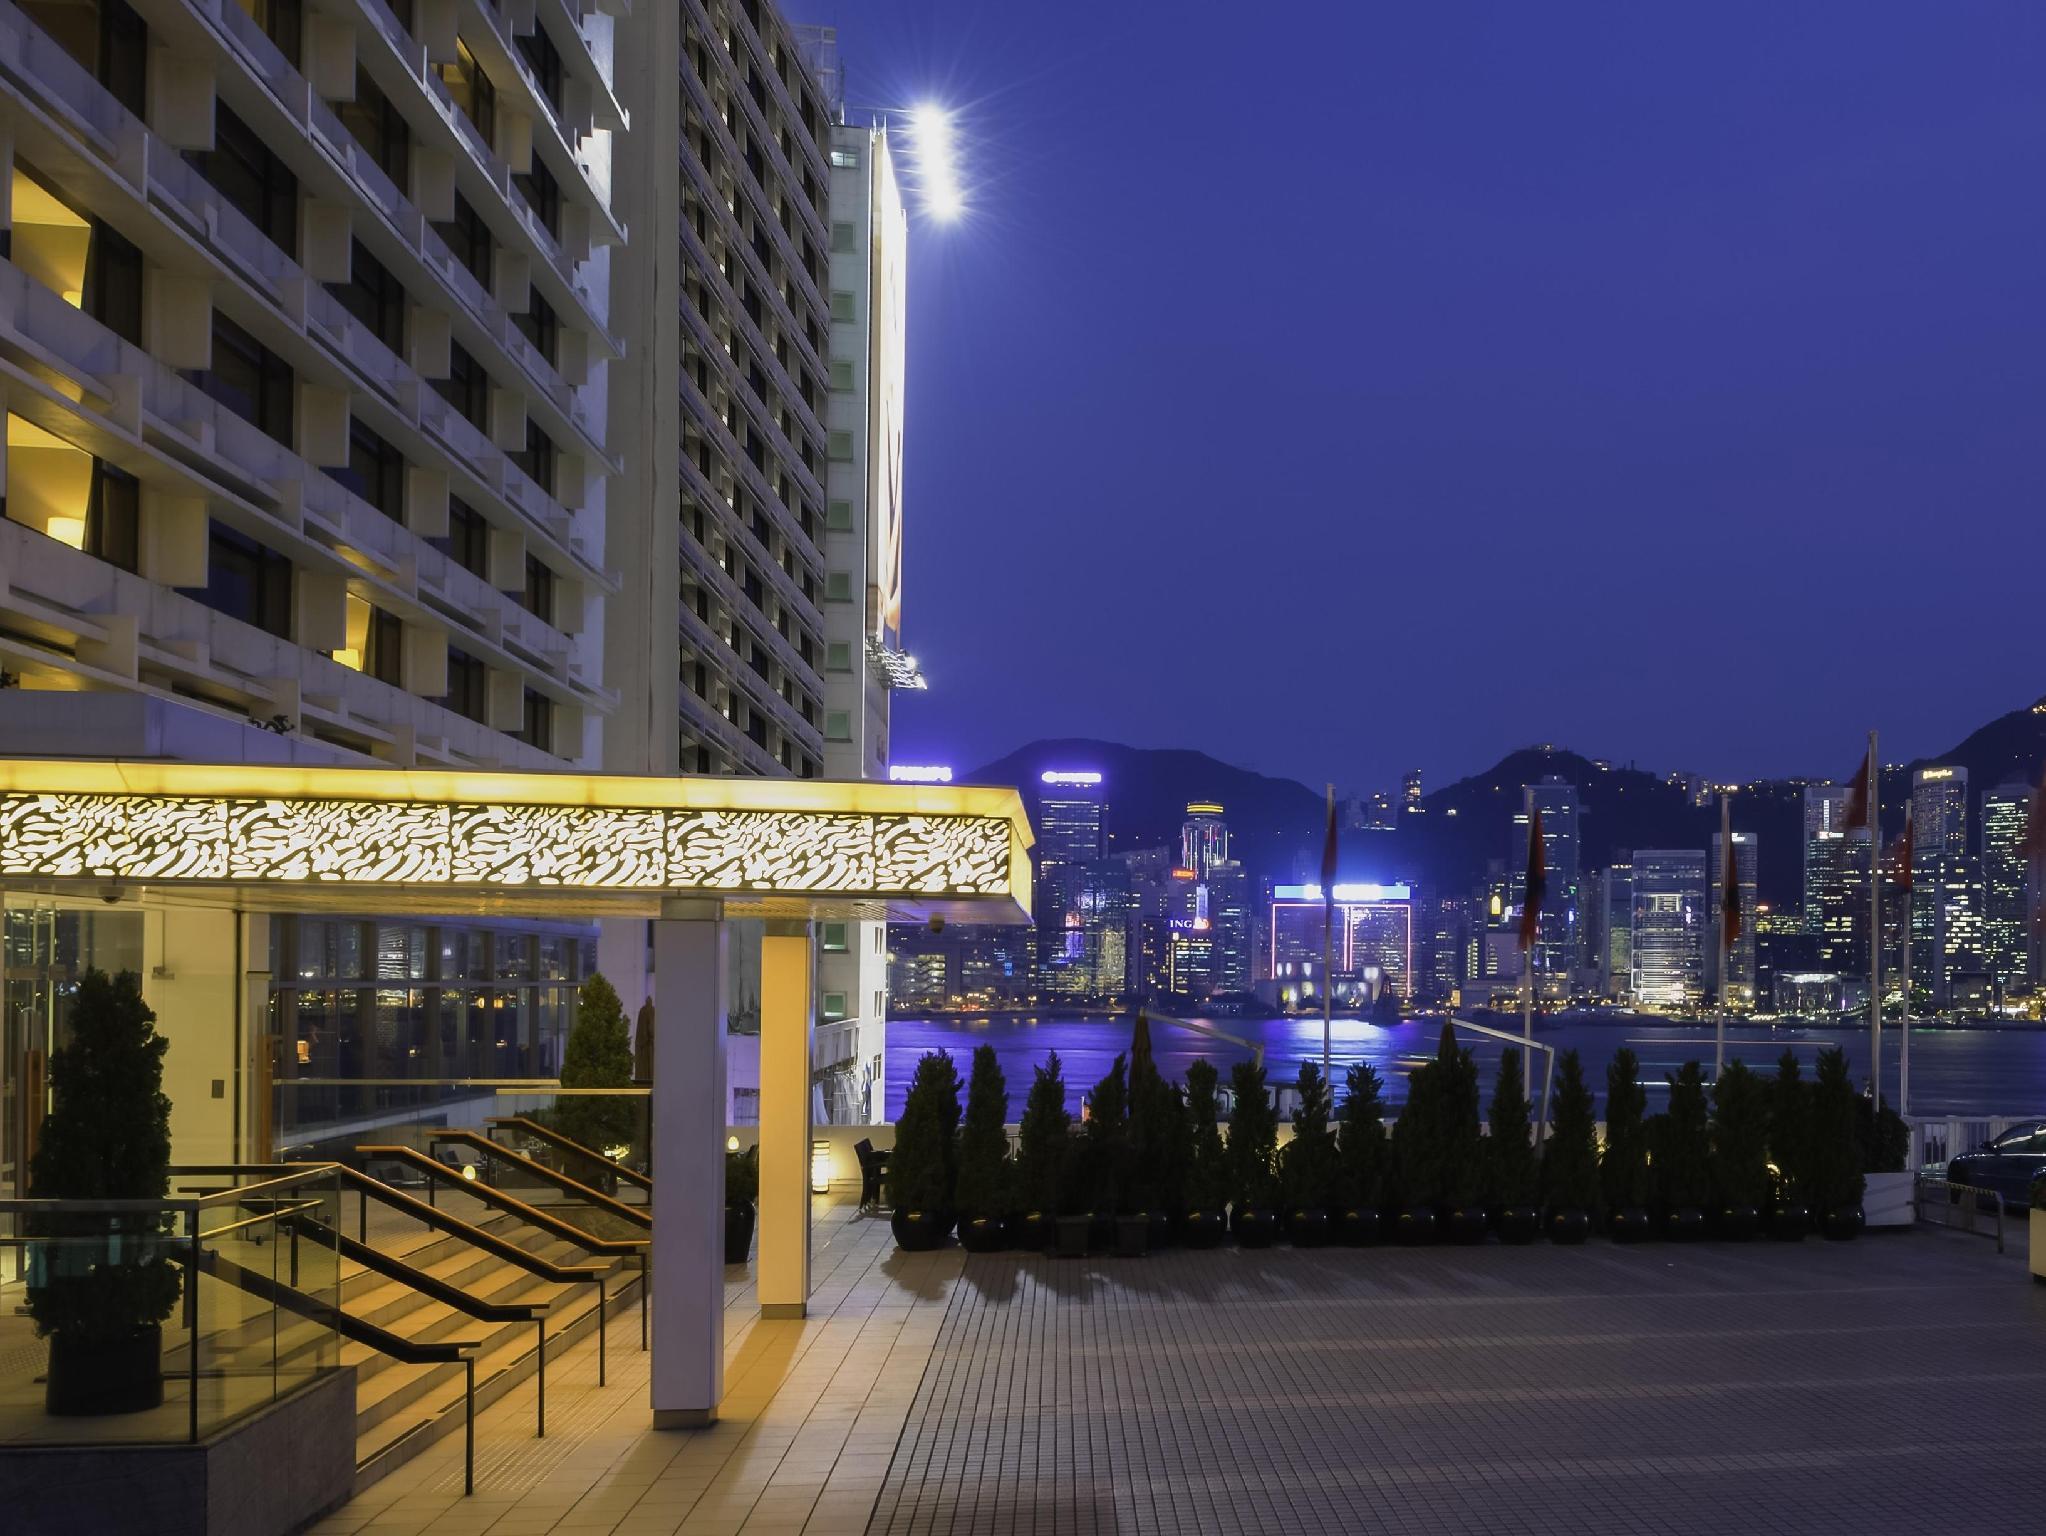 Marco Polo HongKong Hotel Χονγκ Κονγκ